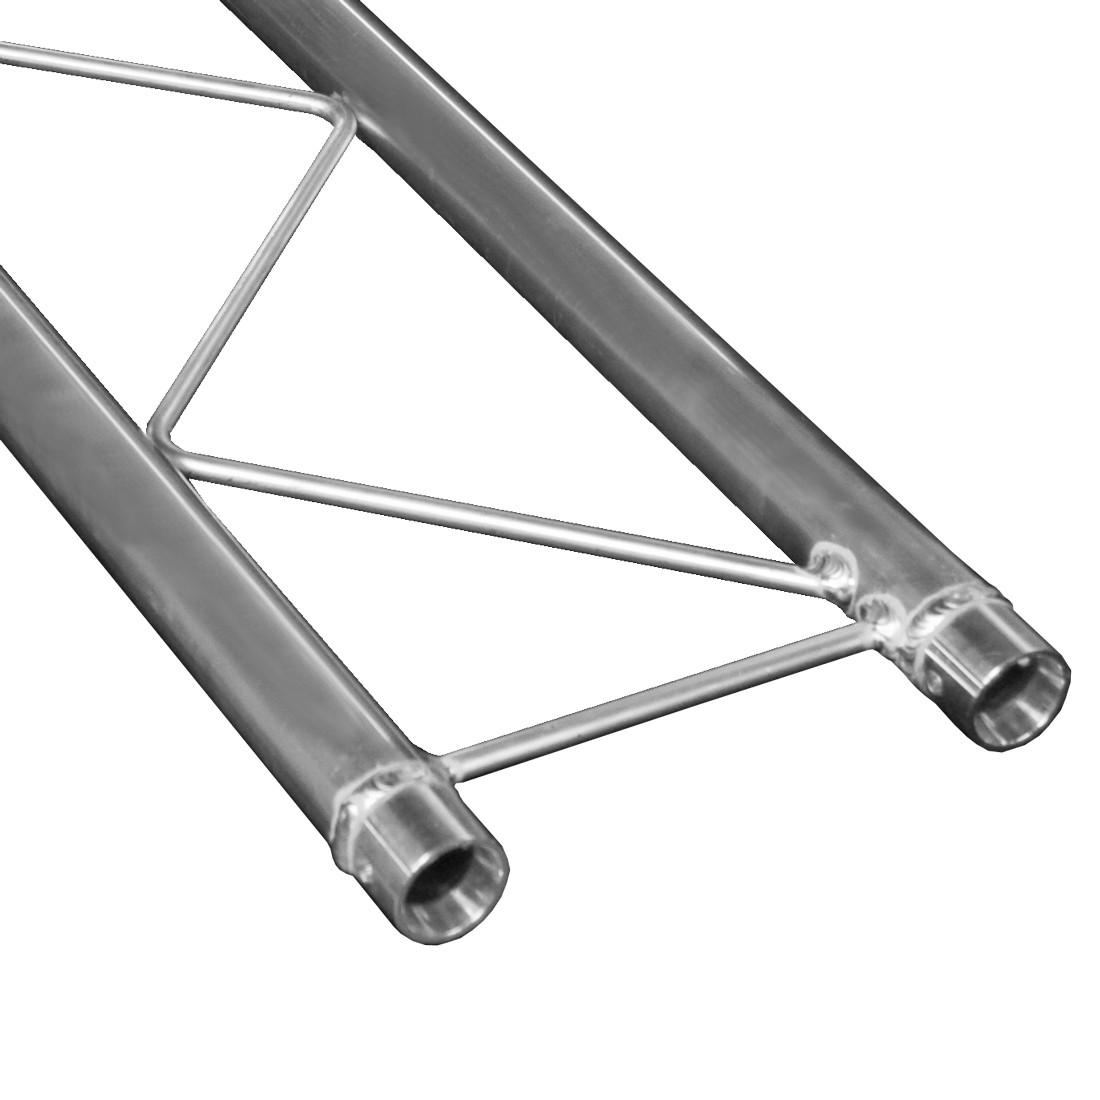 DT 22-250 - DT 22 - Ladder Truss - Products - DuraTruss B V